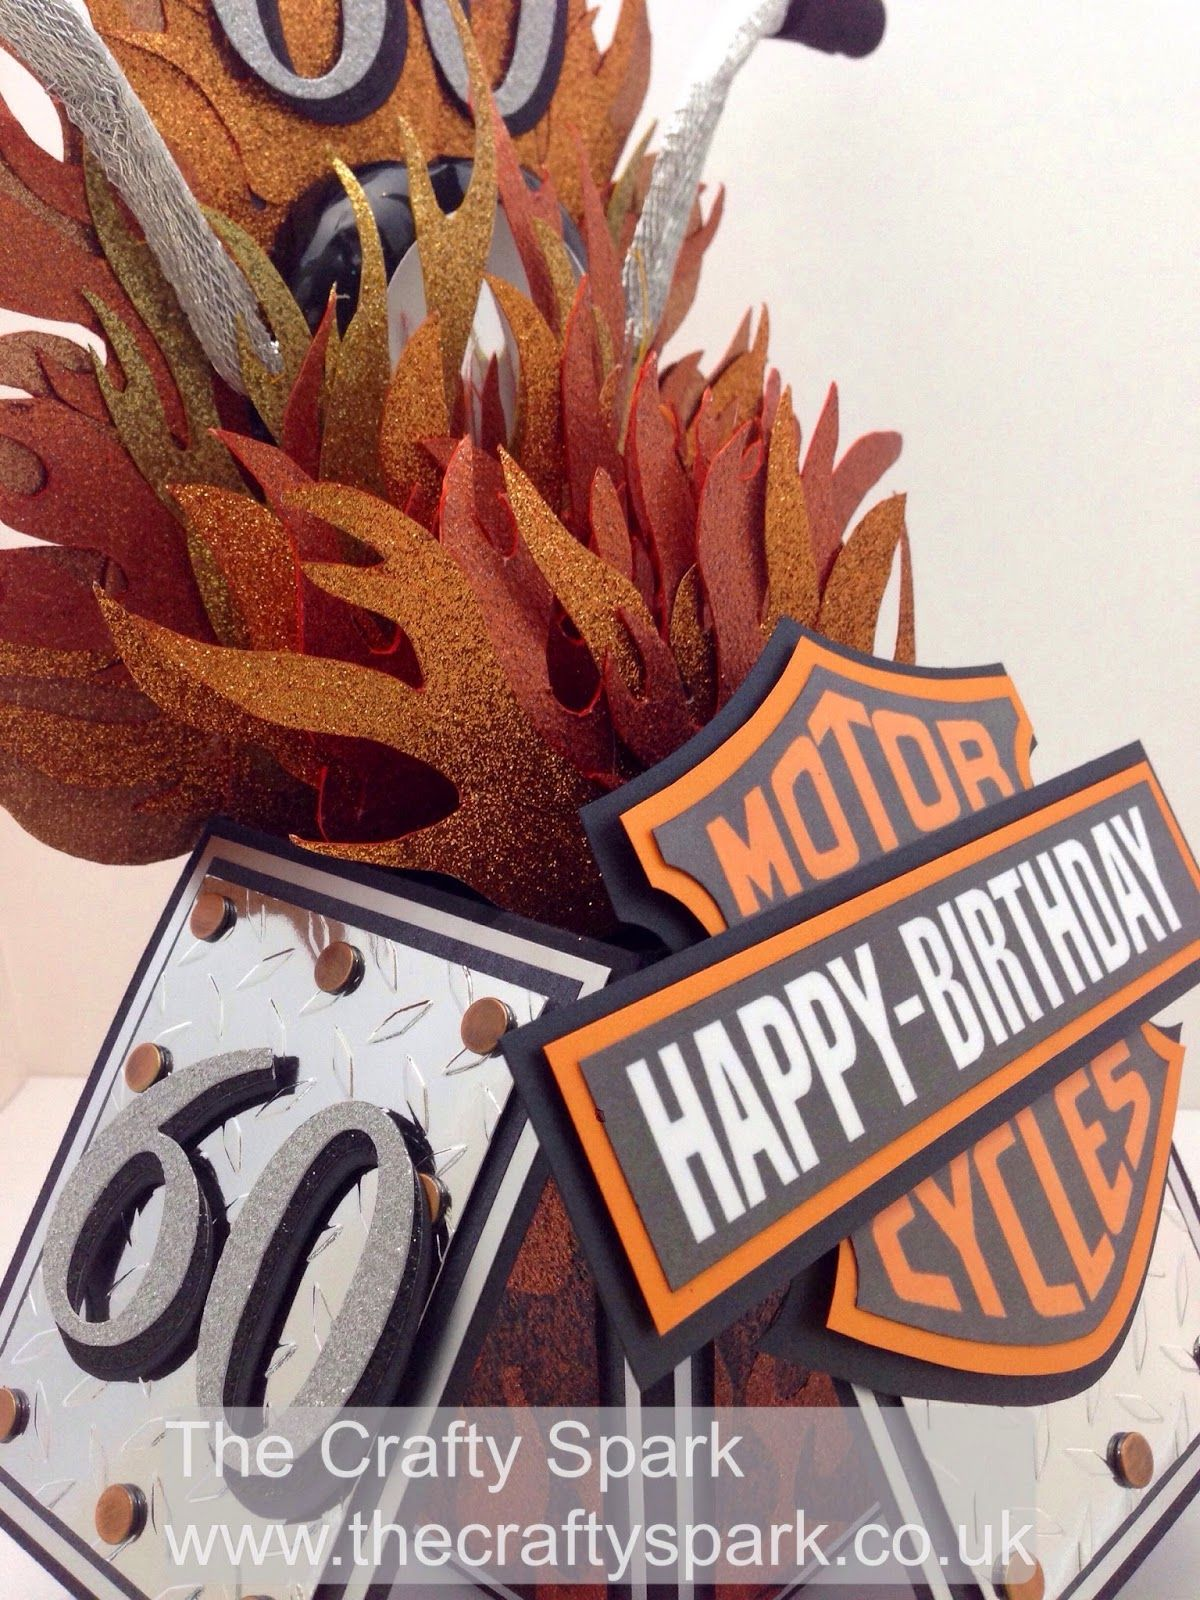 Harley Davidson 60th Birthday Card Stampin Up Independent Demonstrator Lea Denton Order Stampin 60th Birthday Cards Birthday Cards Birthday Card Drawing